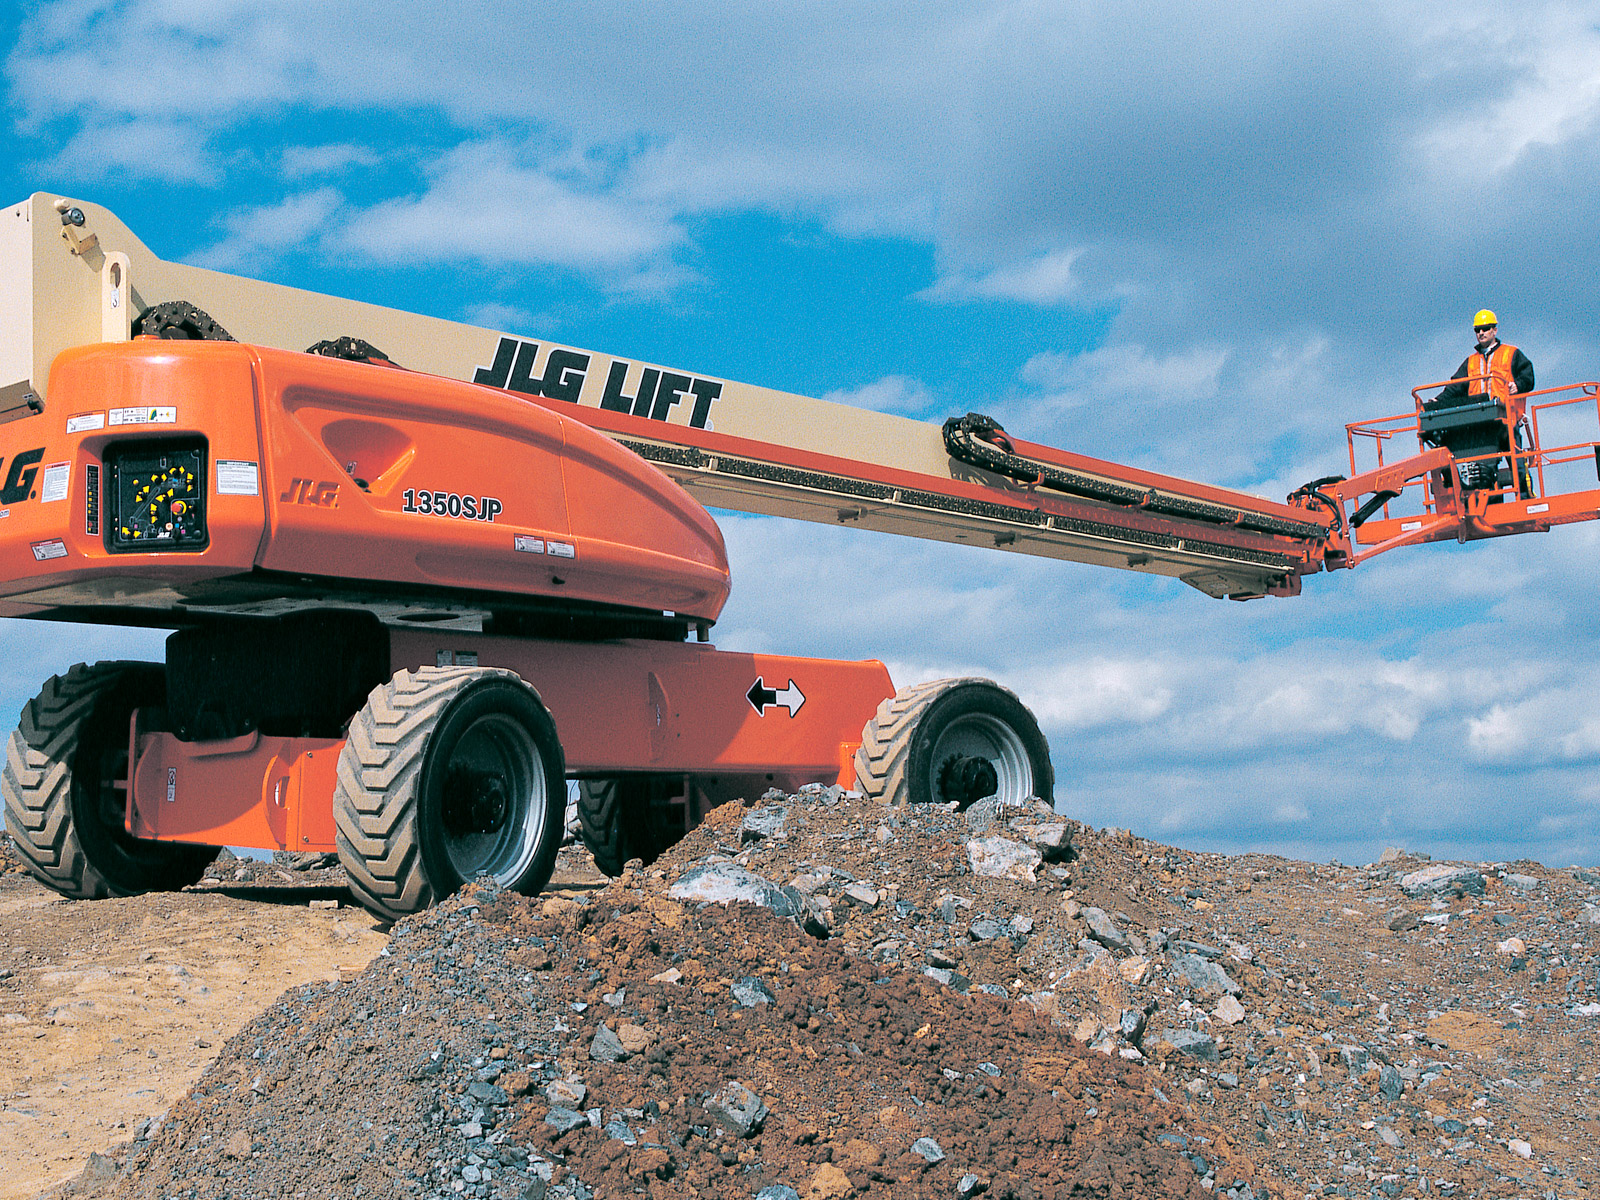 1350sjp driving?w=100 1350sjp telescopic boom lift jlg  at edmiracle.co